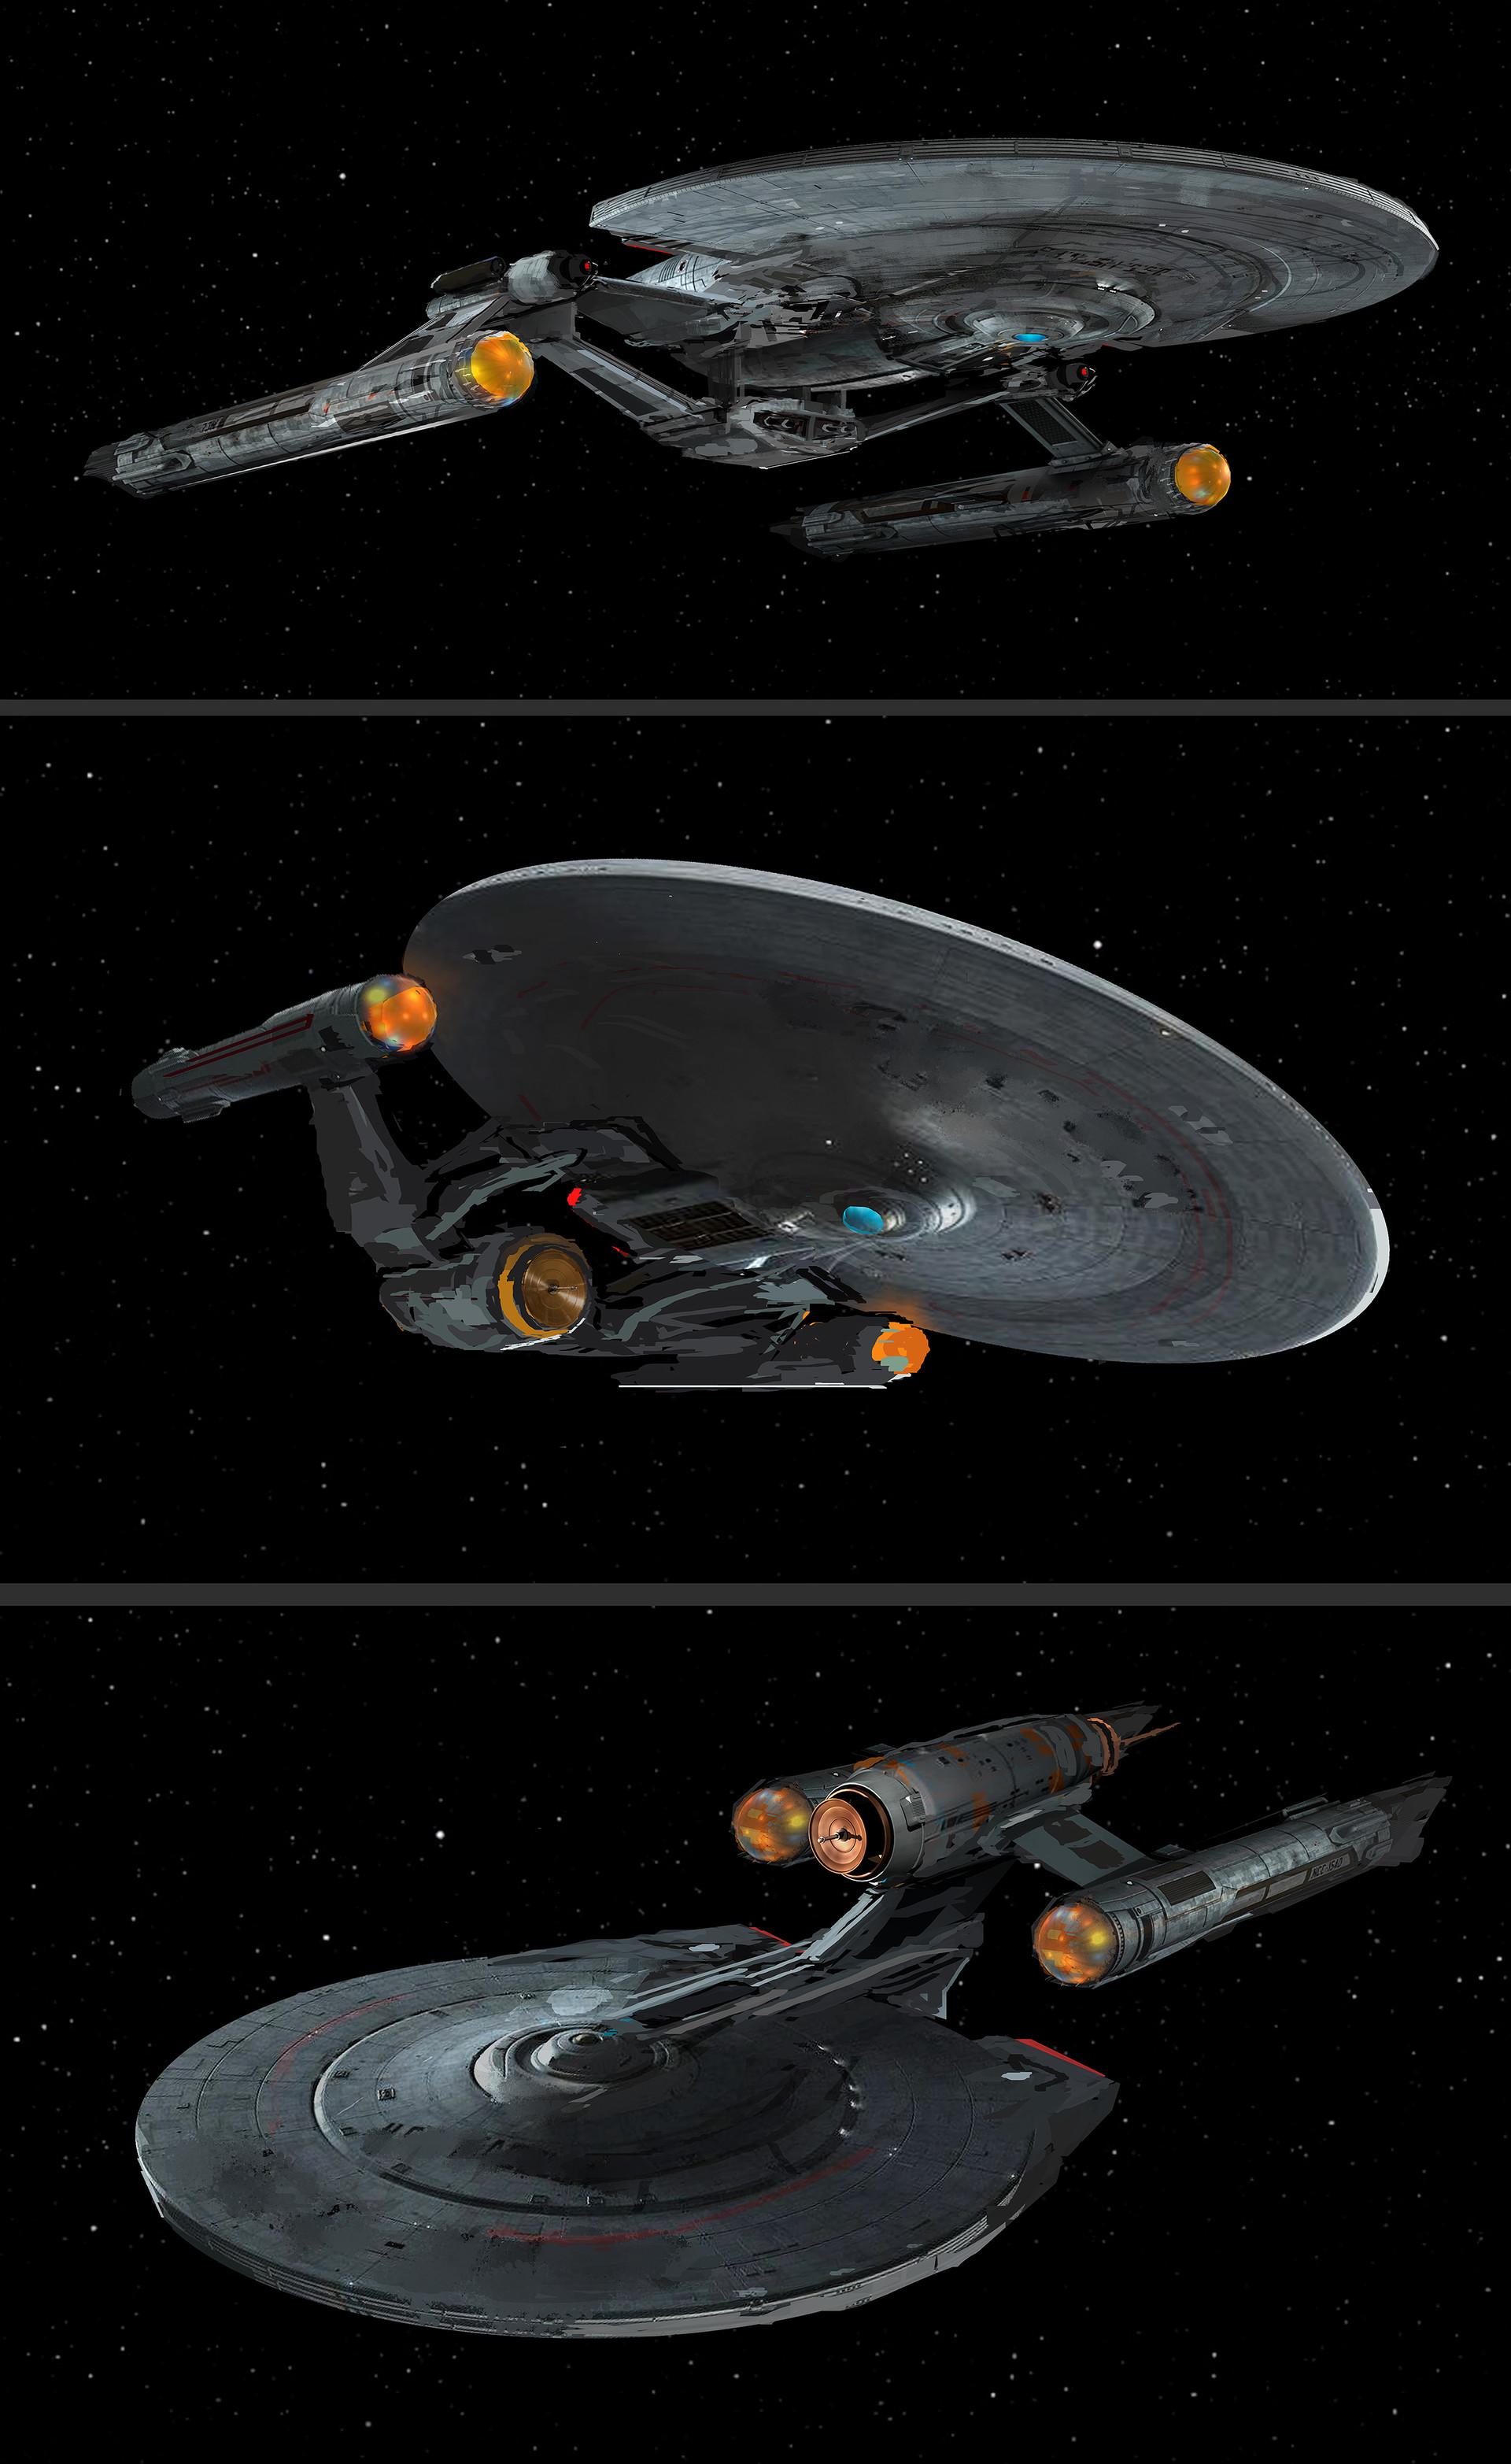 Star Trek Pre-TOS Era